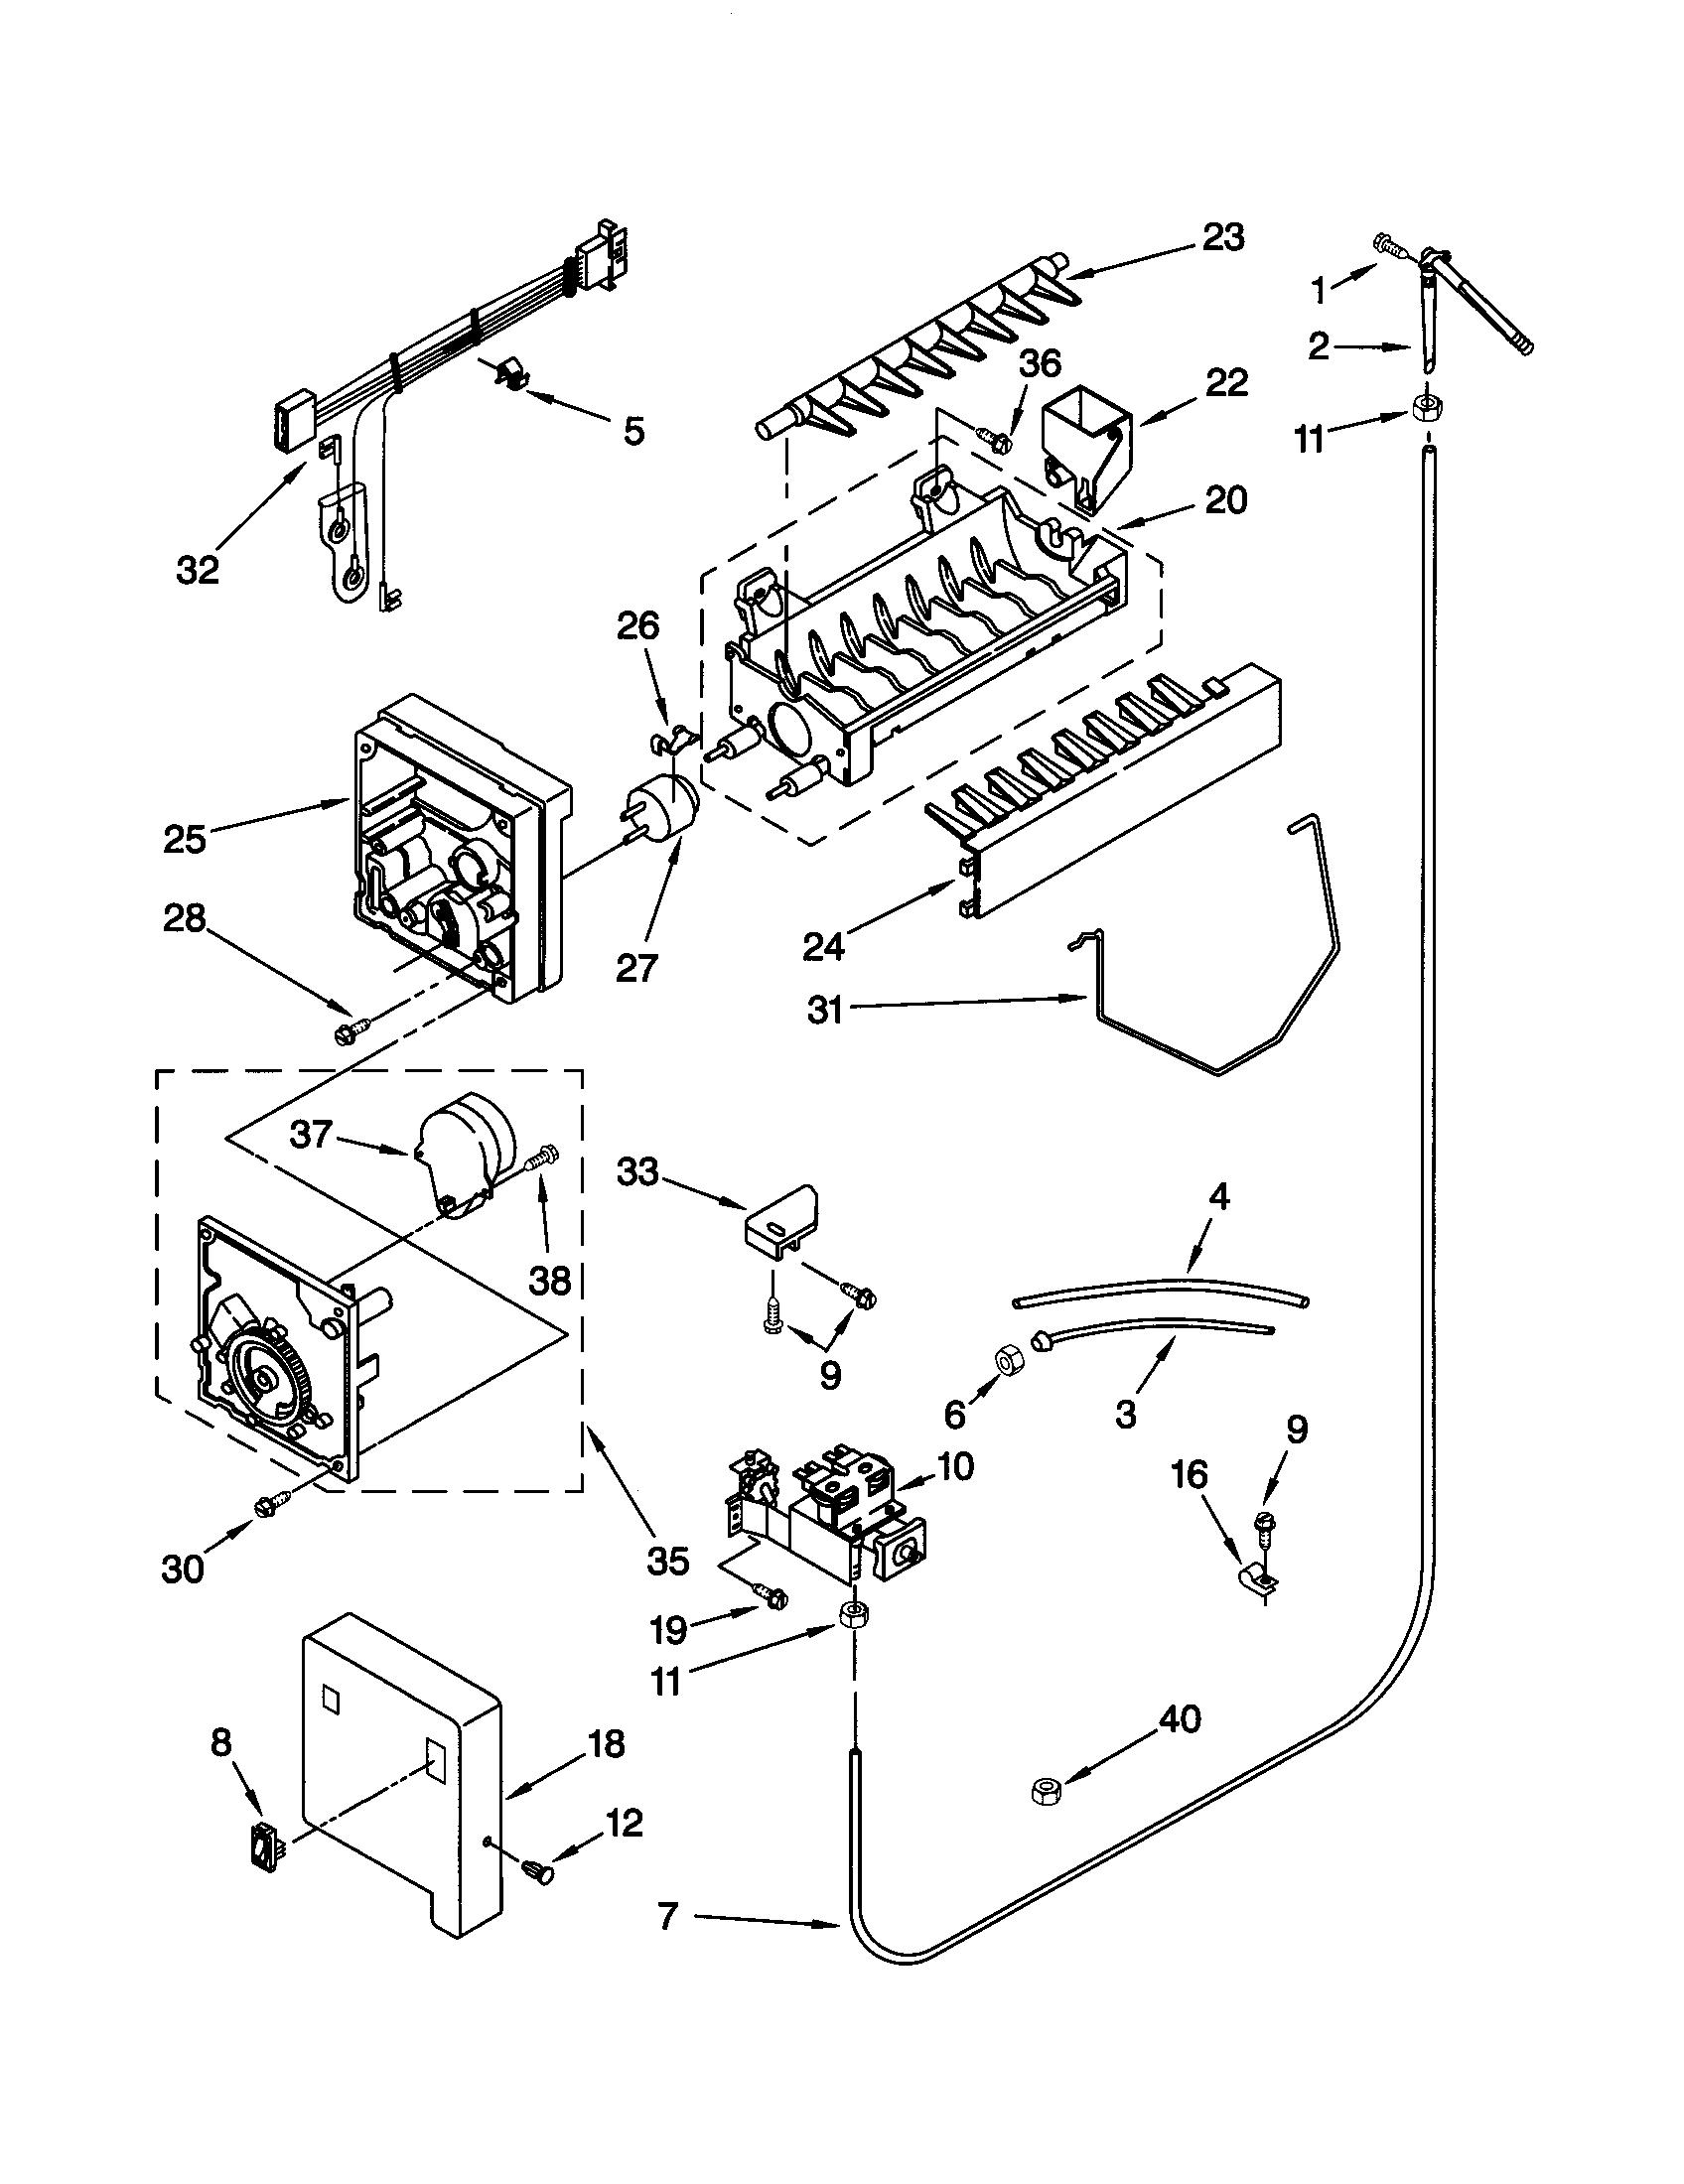 Samsung Ice Maker Wiring Diagram - Diagram Wiring L14 30 30a -  ezgobattery.yenpancane.jeanjaures37.fr | Wiring Samsung Diagram Refrigerator Rb217a |  | Wiring Diagram Resource